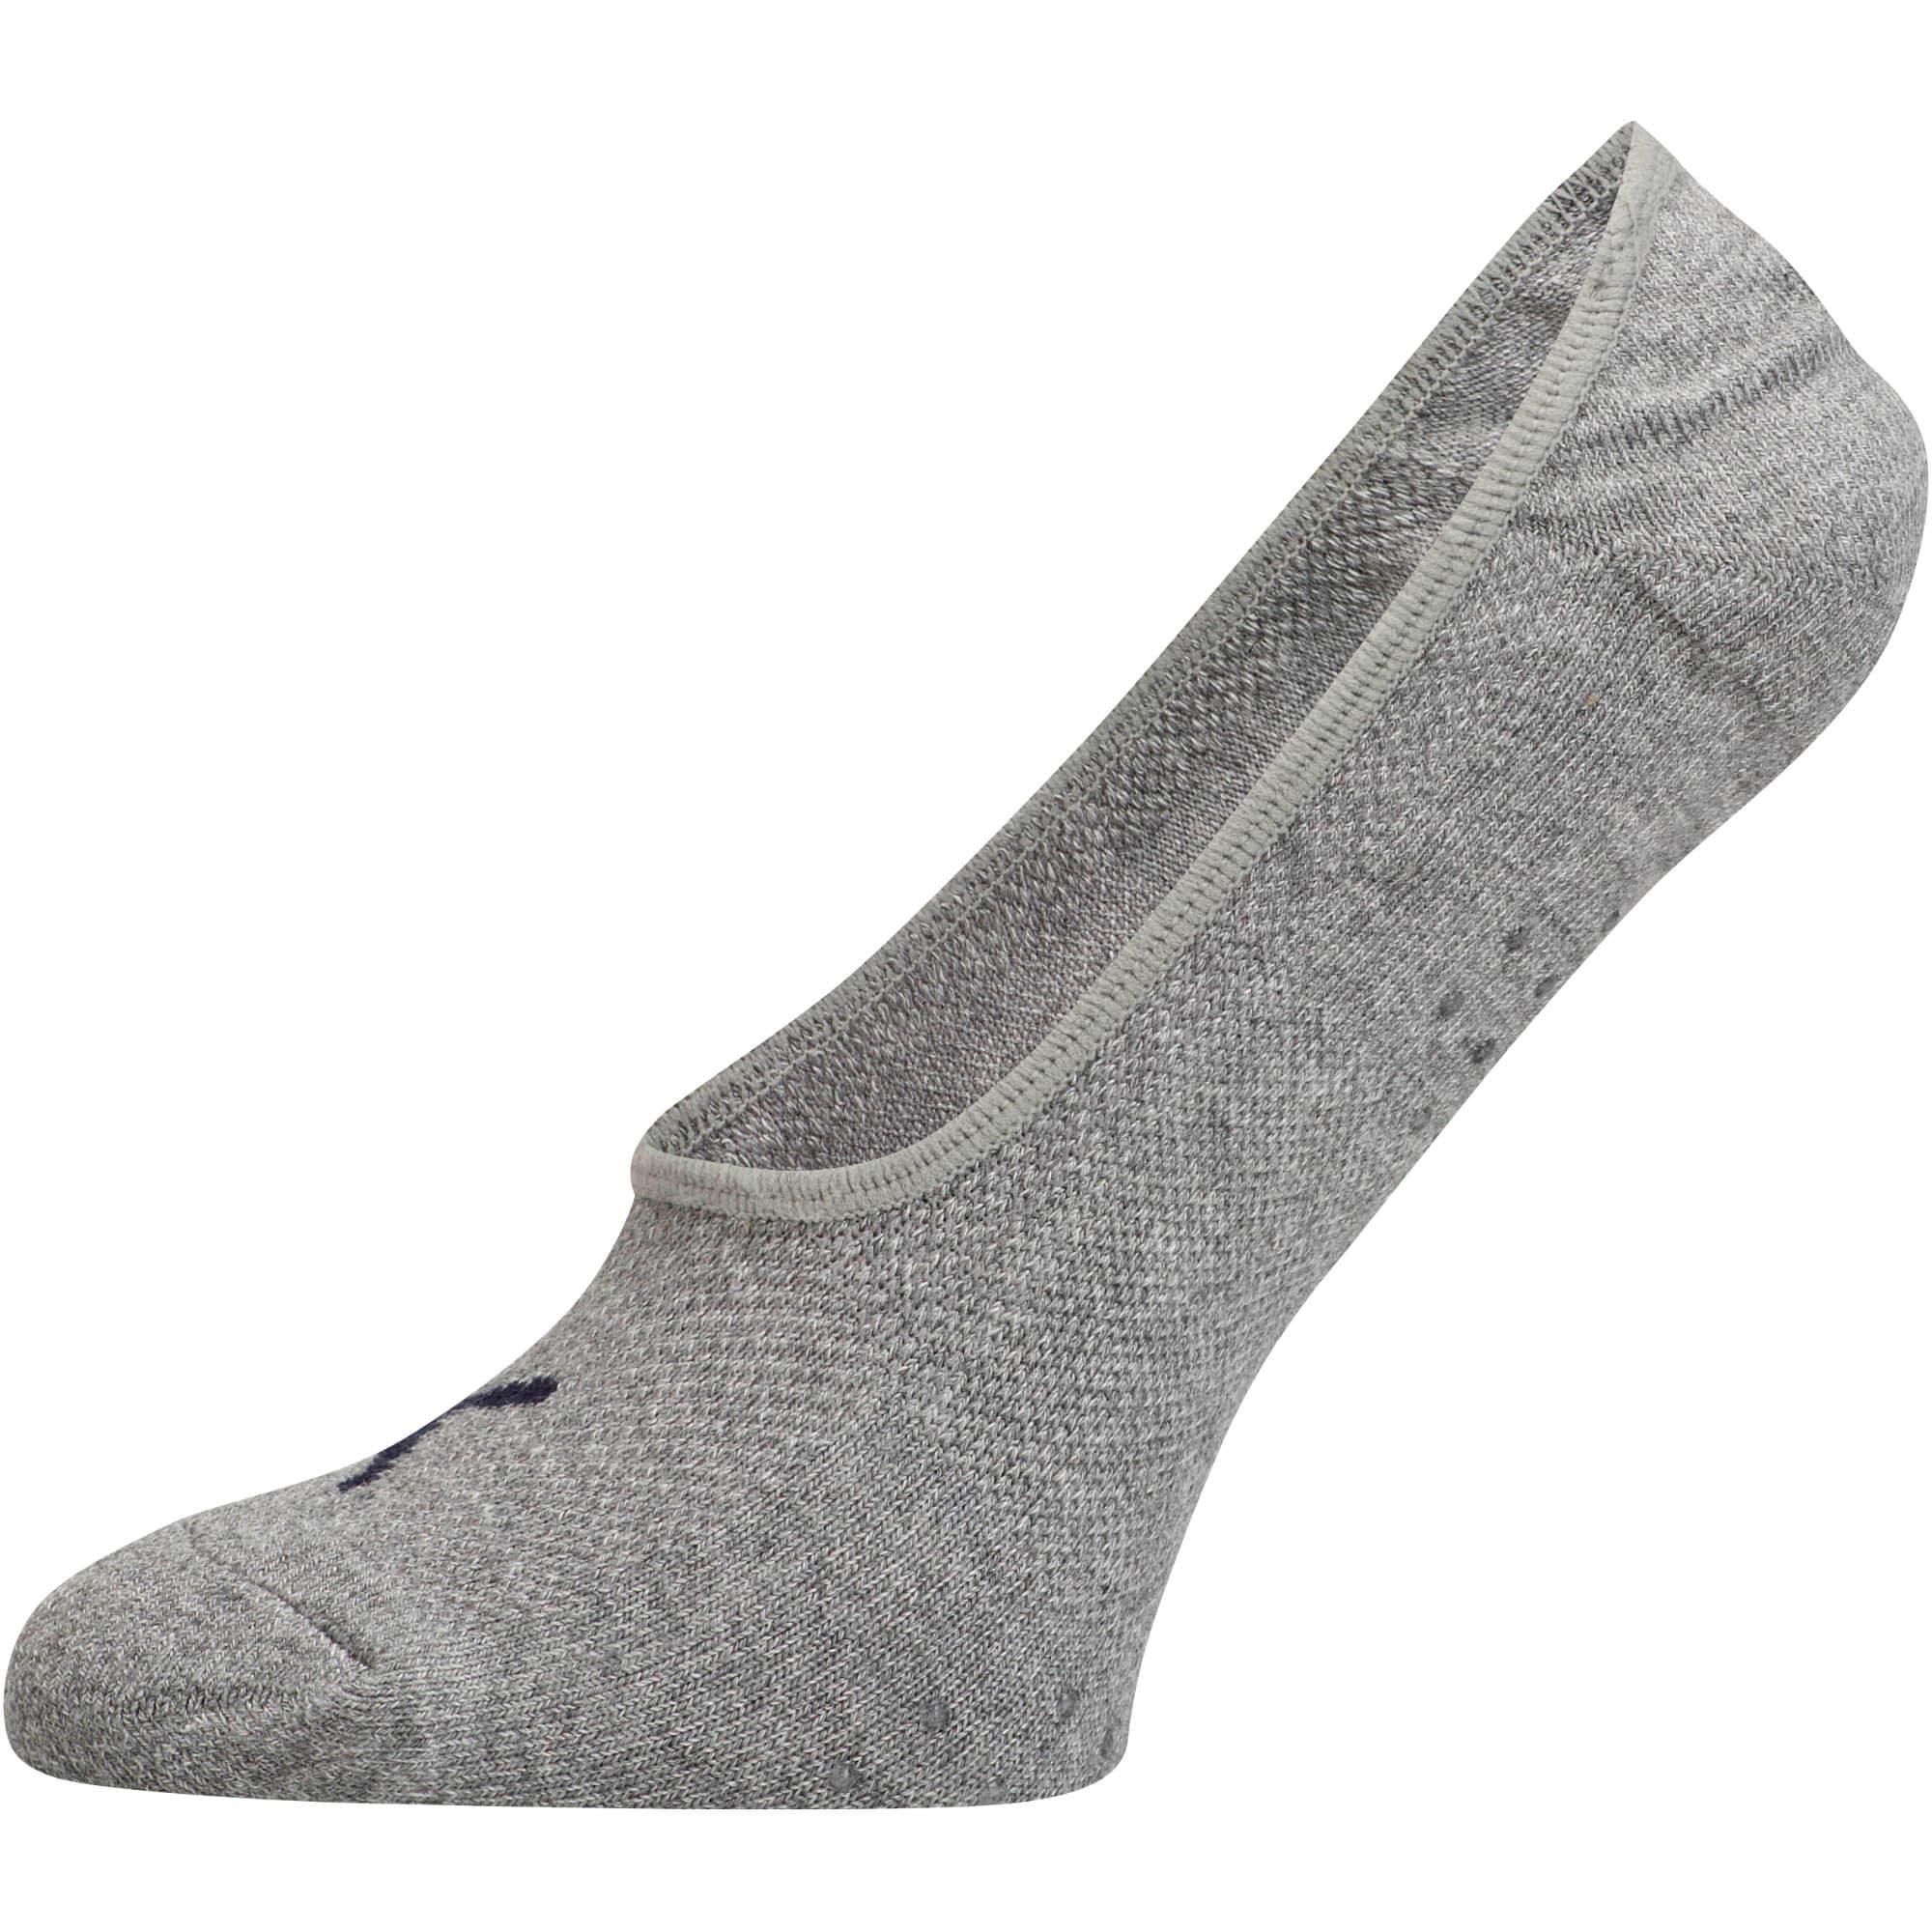 Thumbnail 2 of Women's Select Terry Liner Socks [3 Pack], GREY / PINK, medium